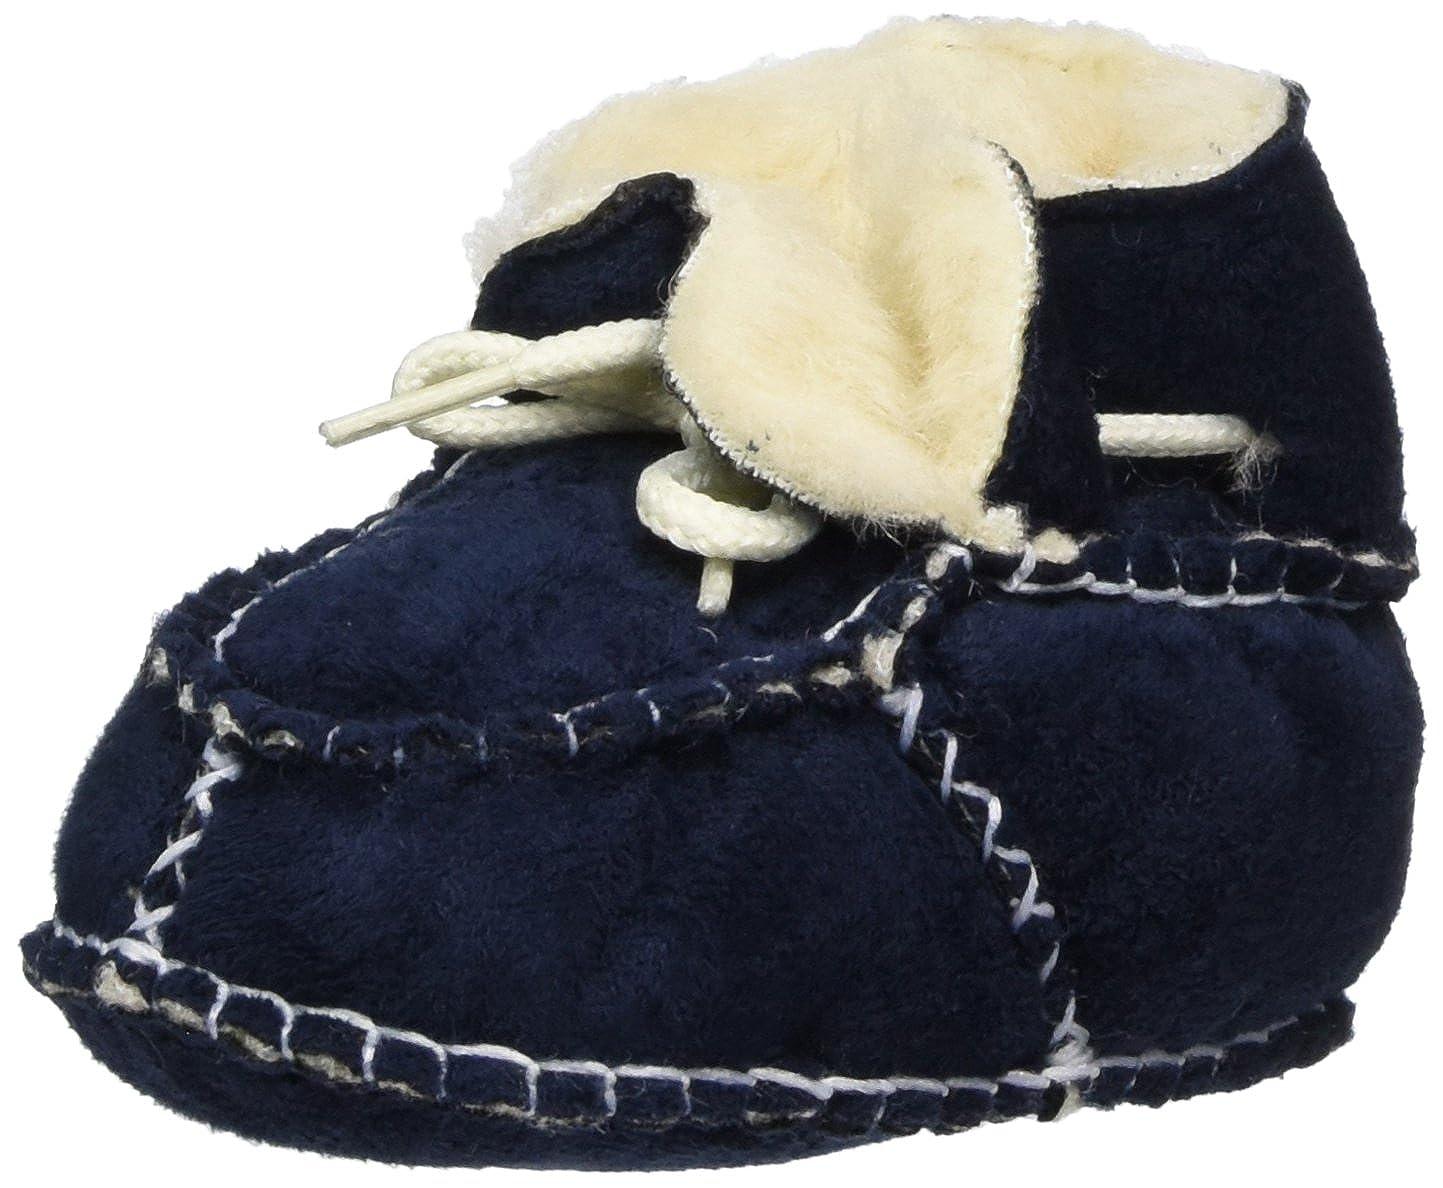 Playshoes Unisex Baby Babyschuhe in Lammfell-Optik Zum Binden Krabbel-& Hausschuhe 105931.0